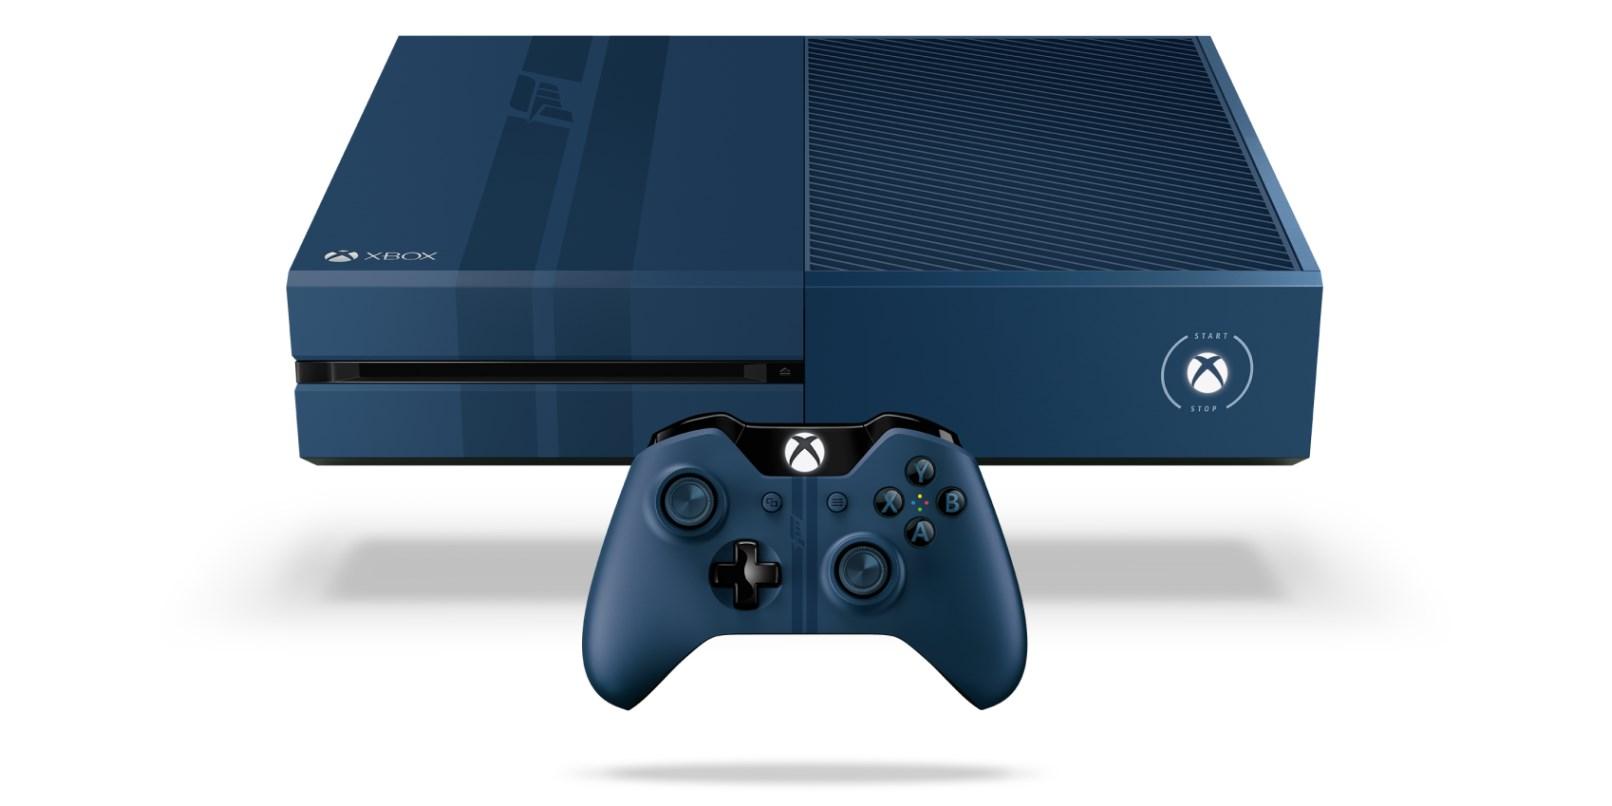 Microsoft Sınırlı Sayıda Forza Motorsport 6 Xbox One Oyun Konsolu Duyurdu!